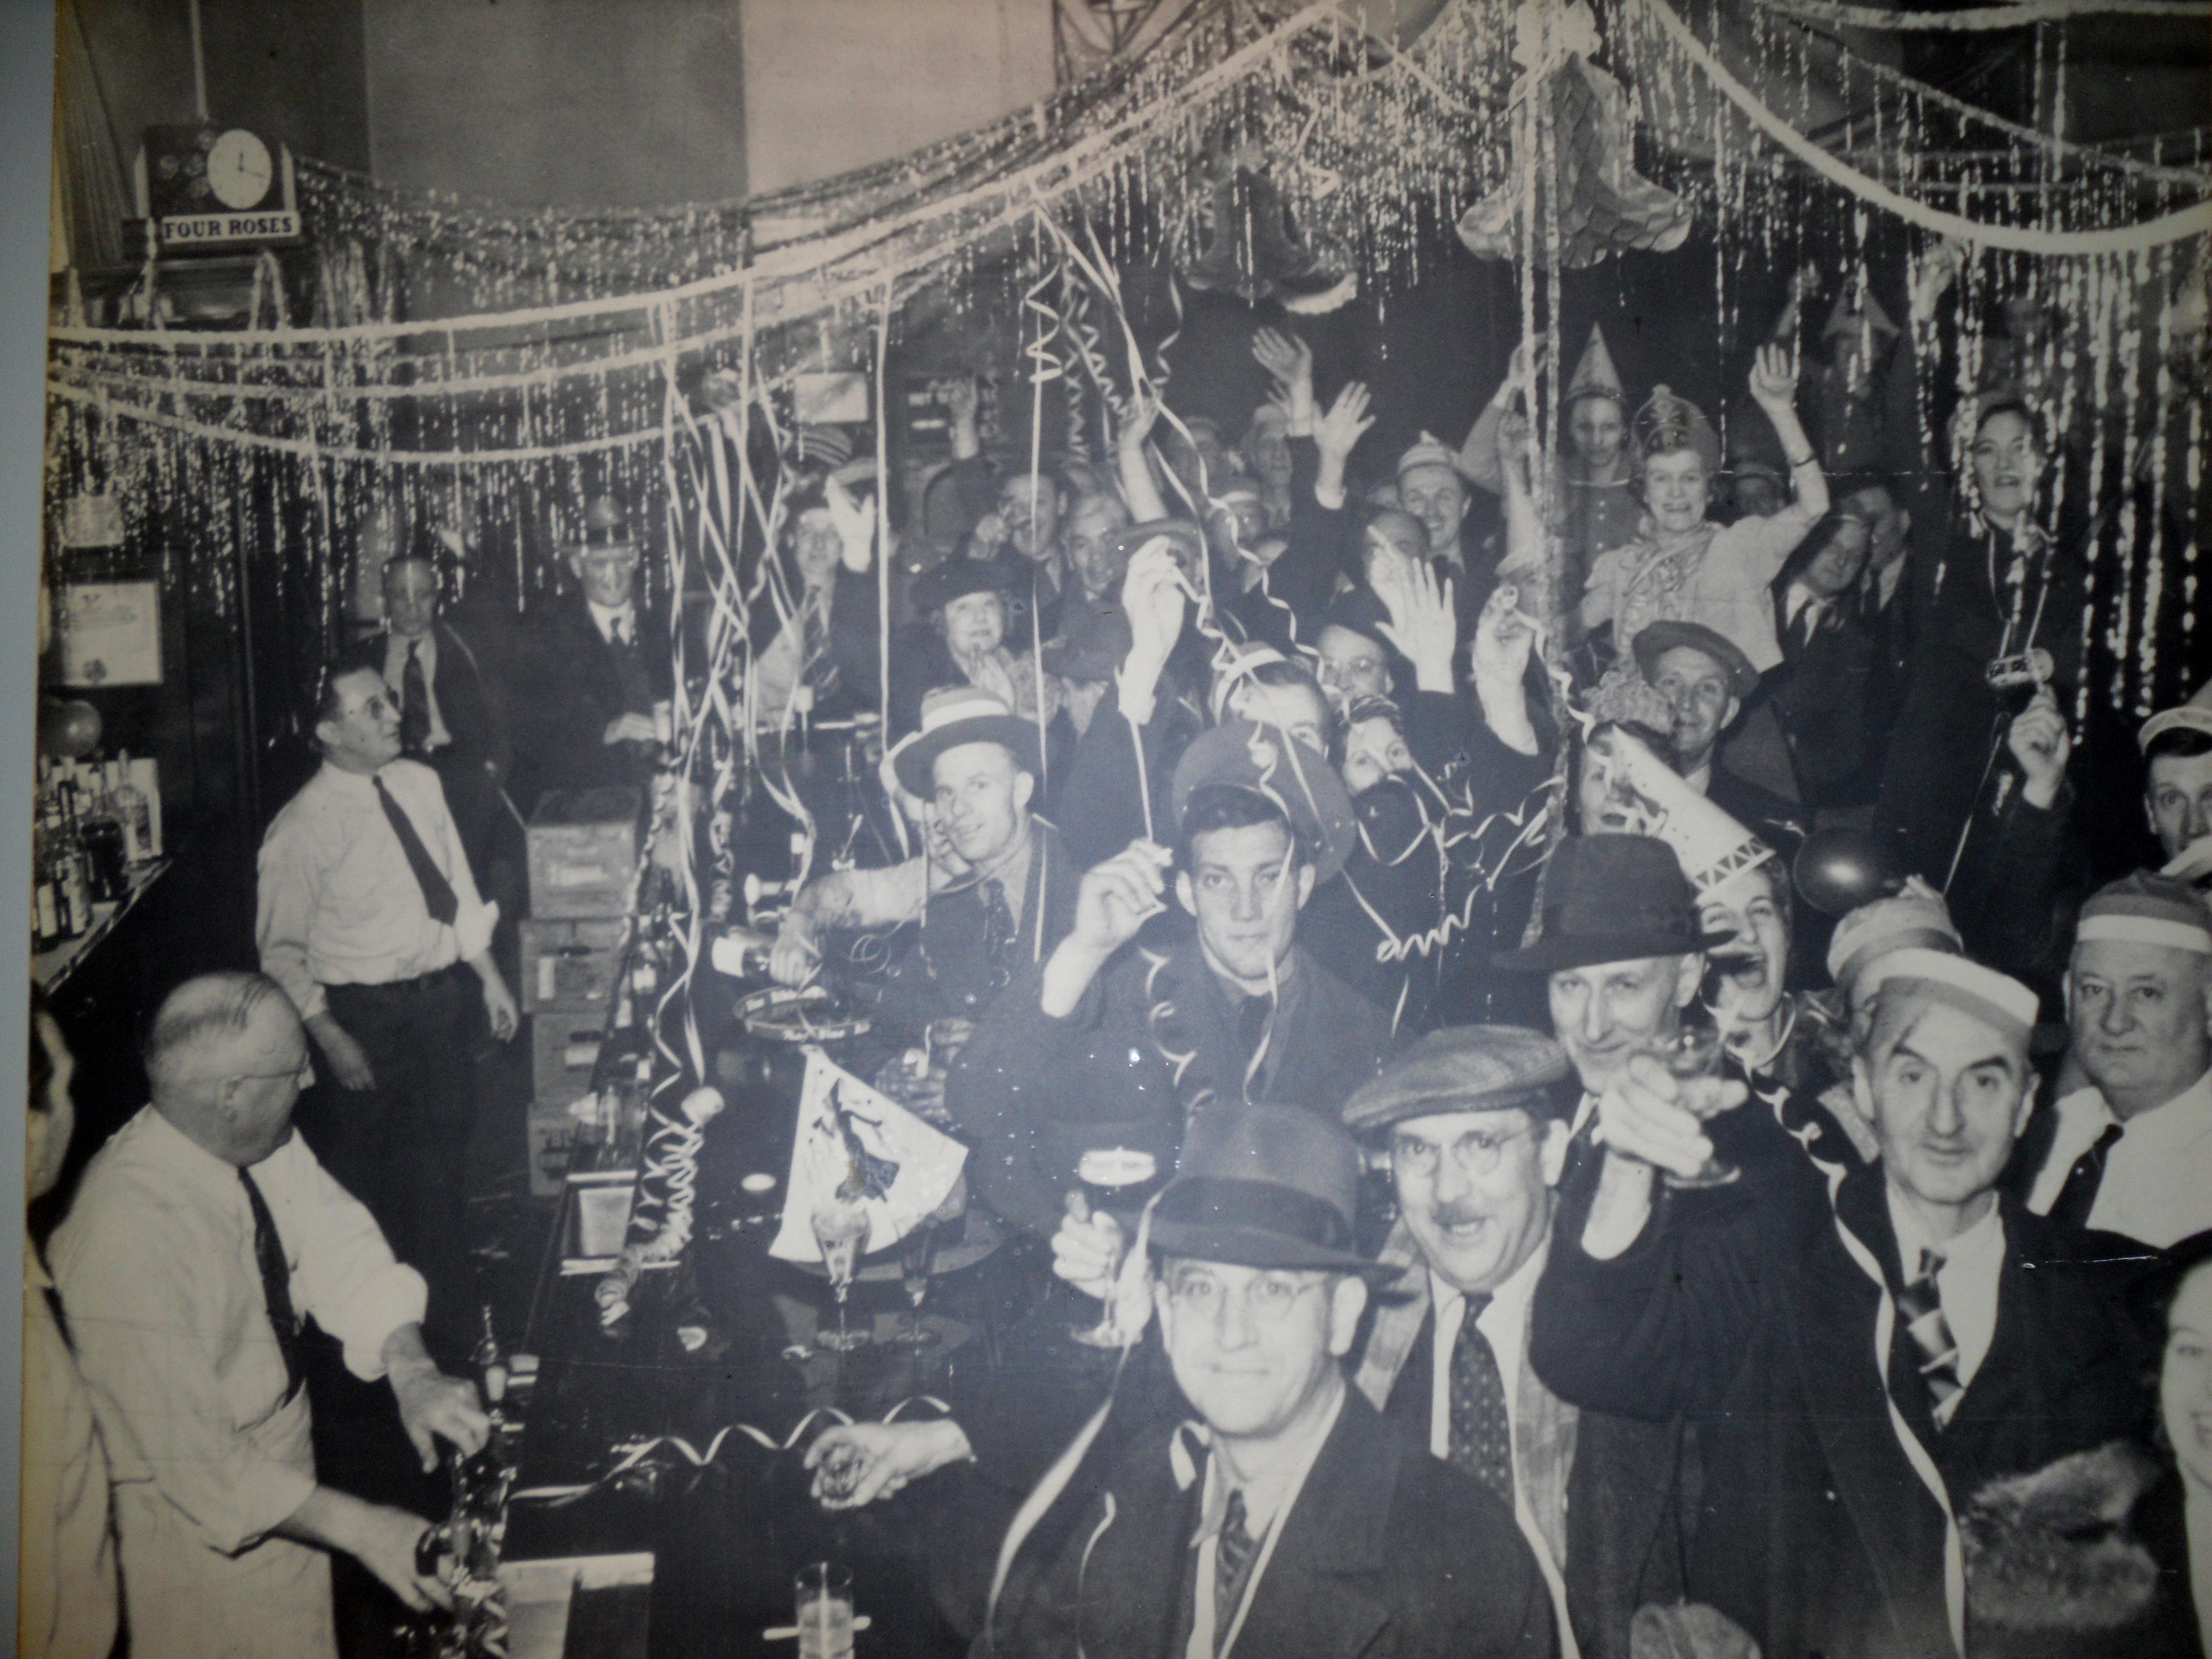 1933 NYE party